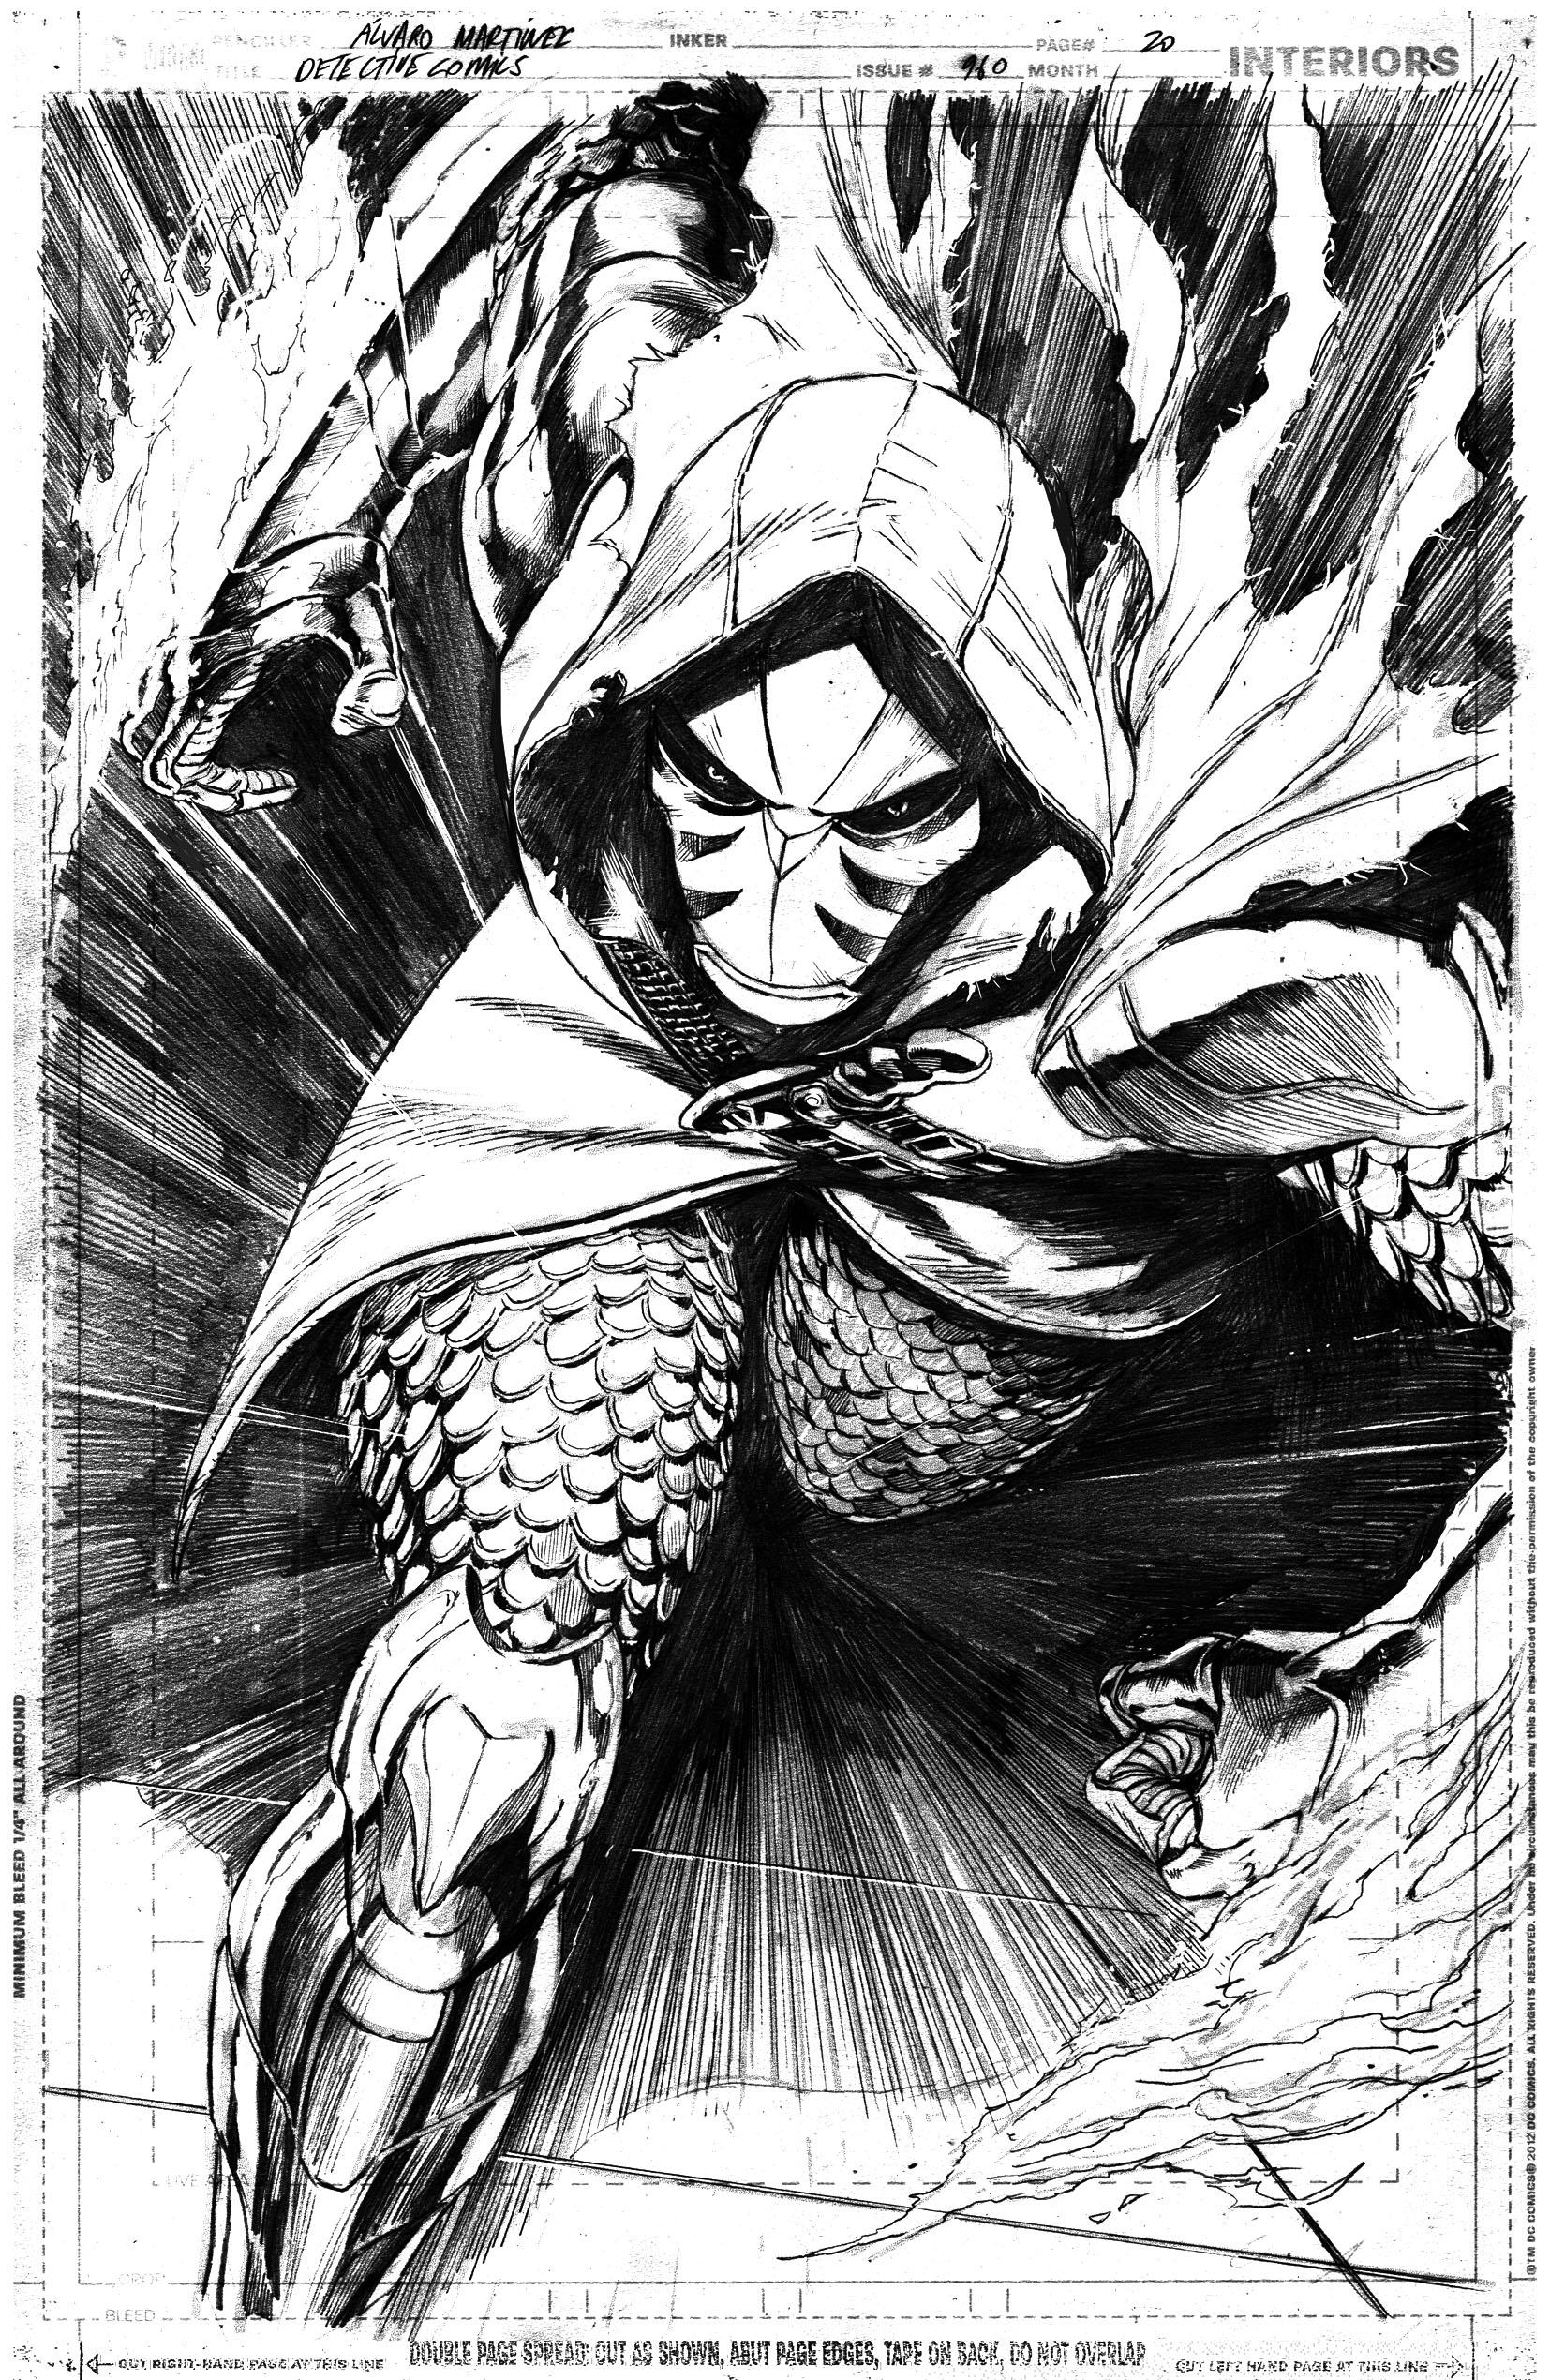 DDetective Comics #960 page 20